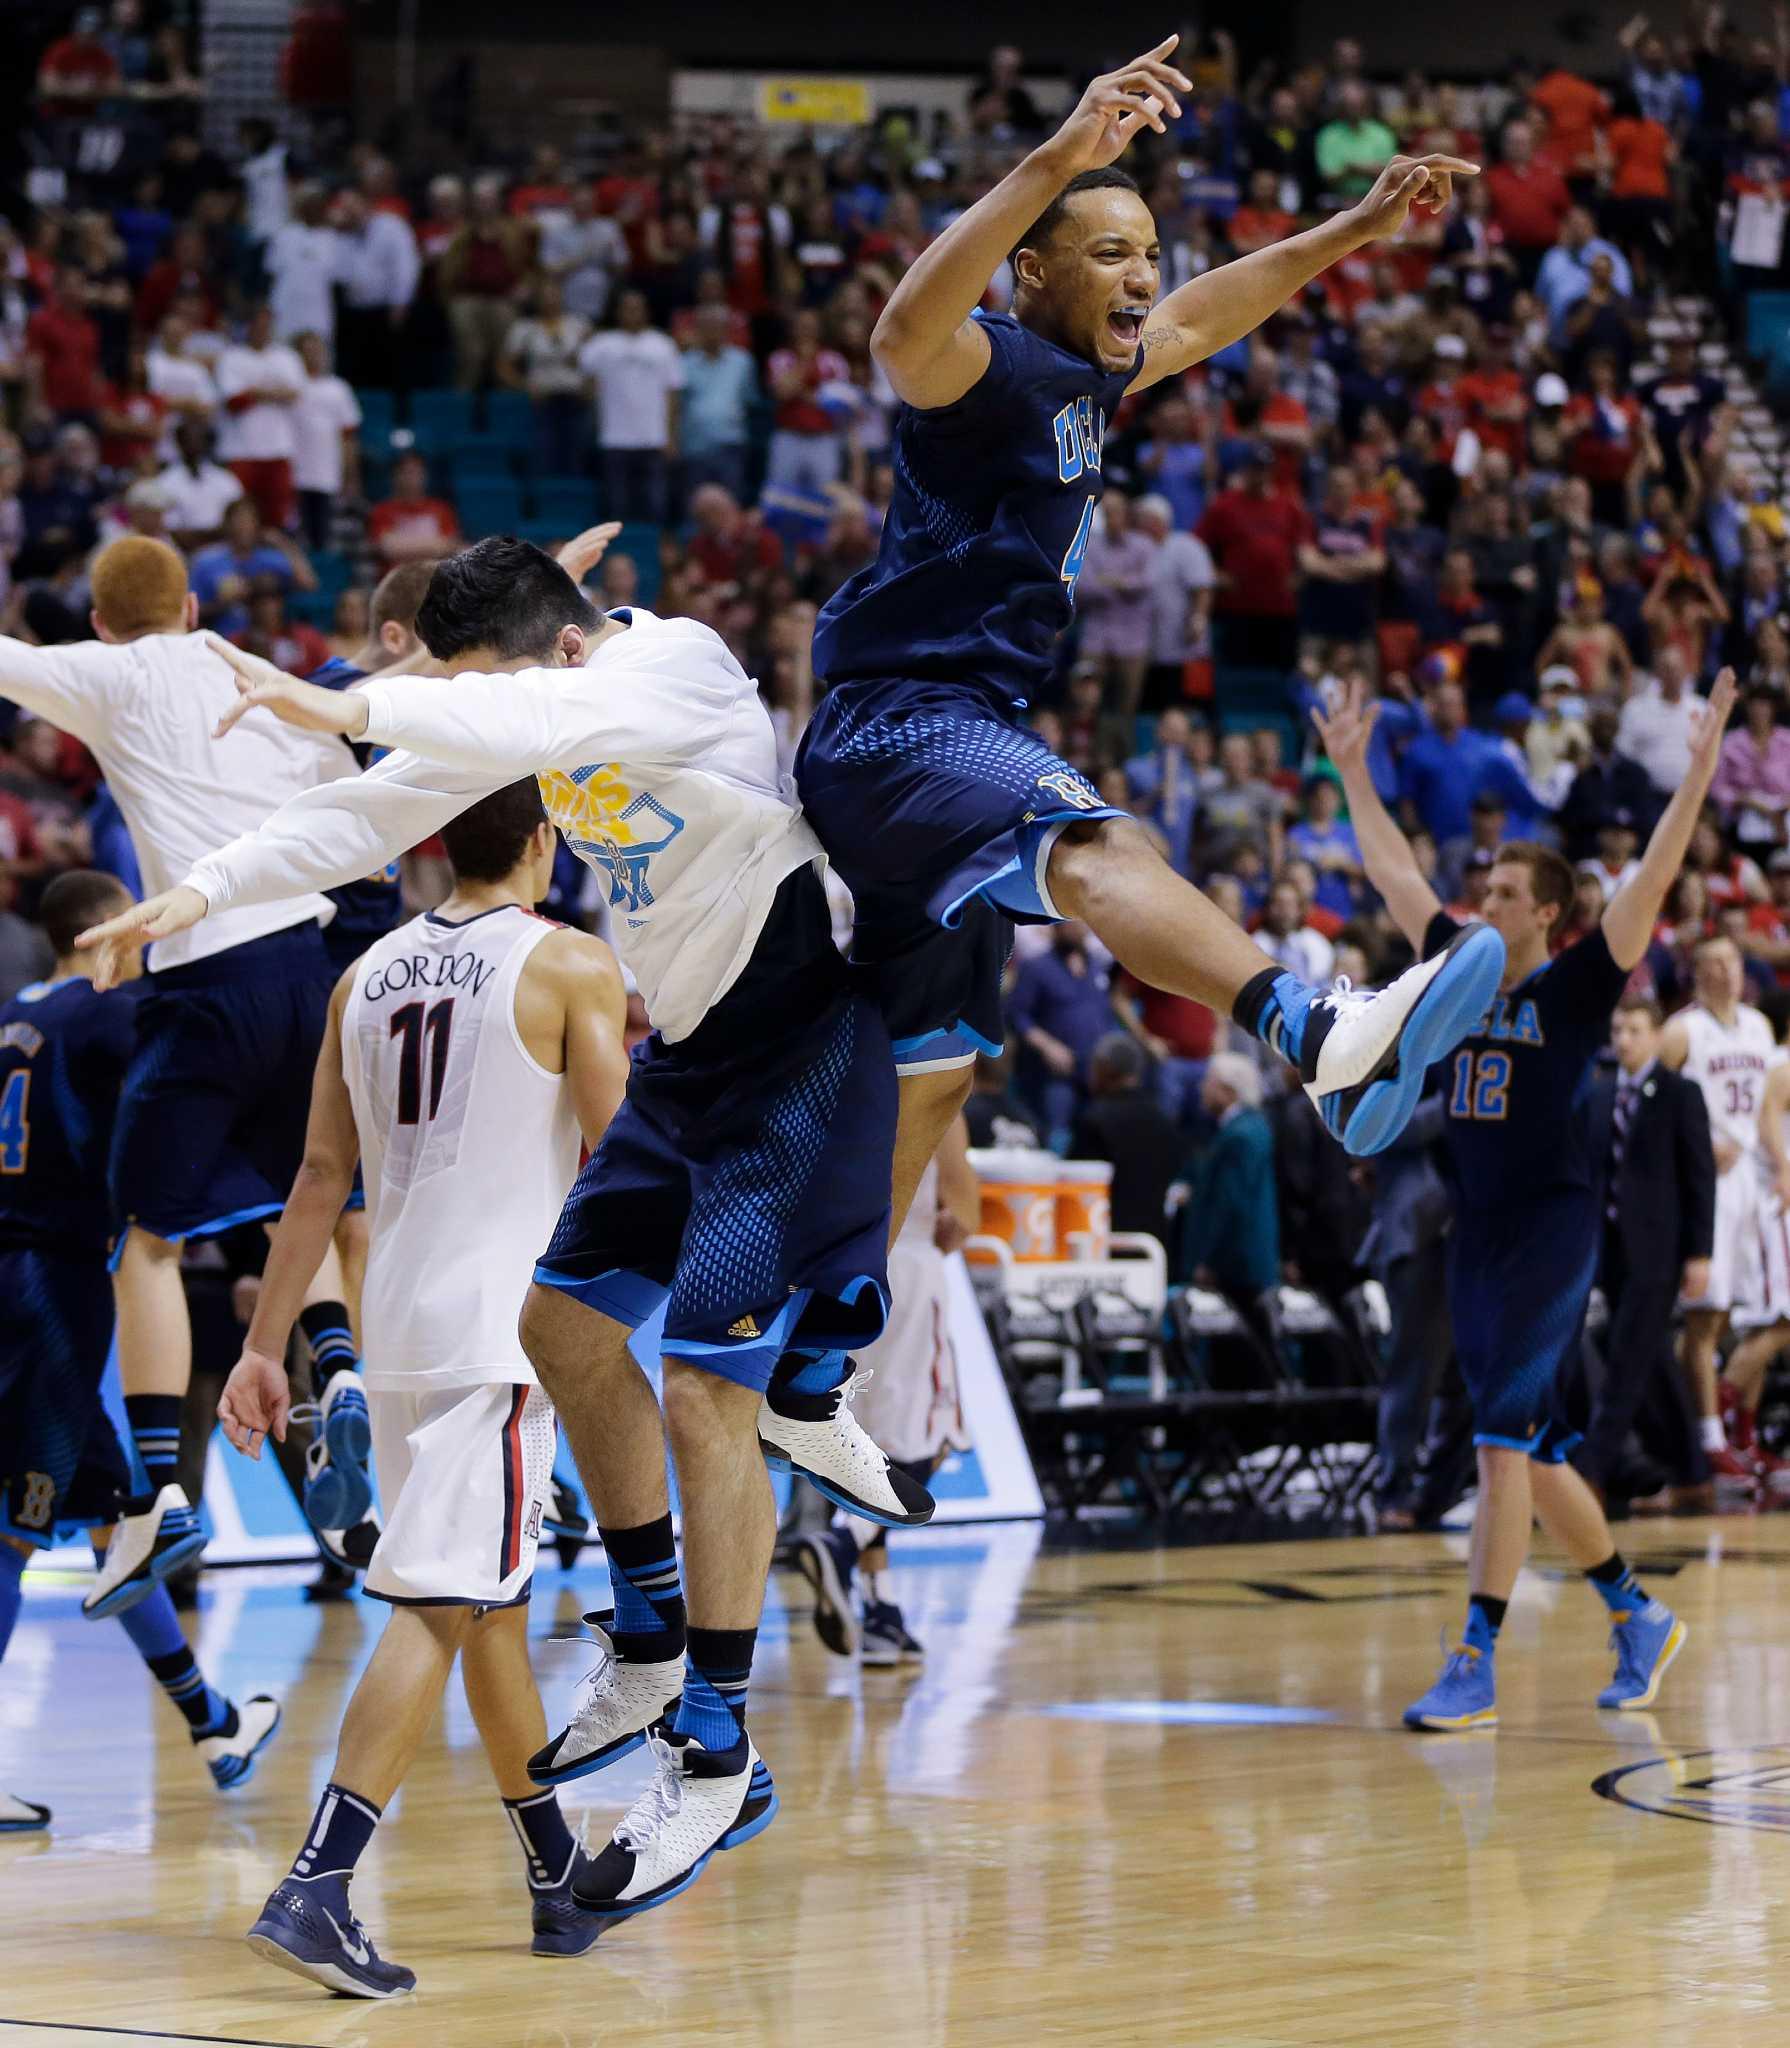 College Basketball: UCLA Beats Arizona To Win Pac-12 Title